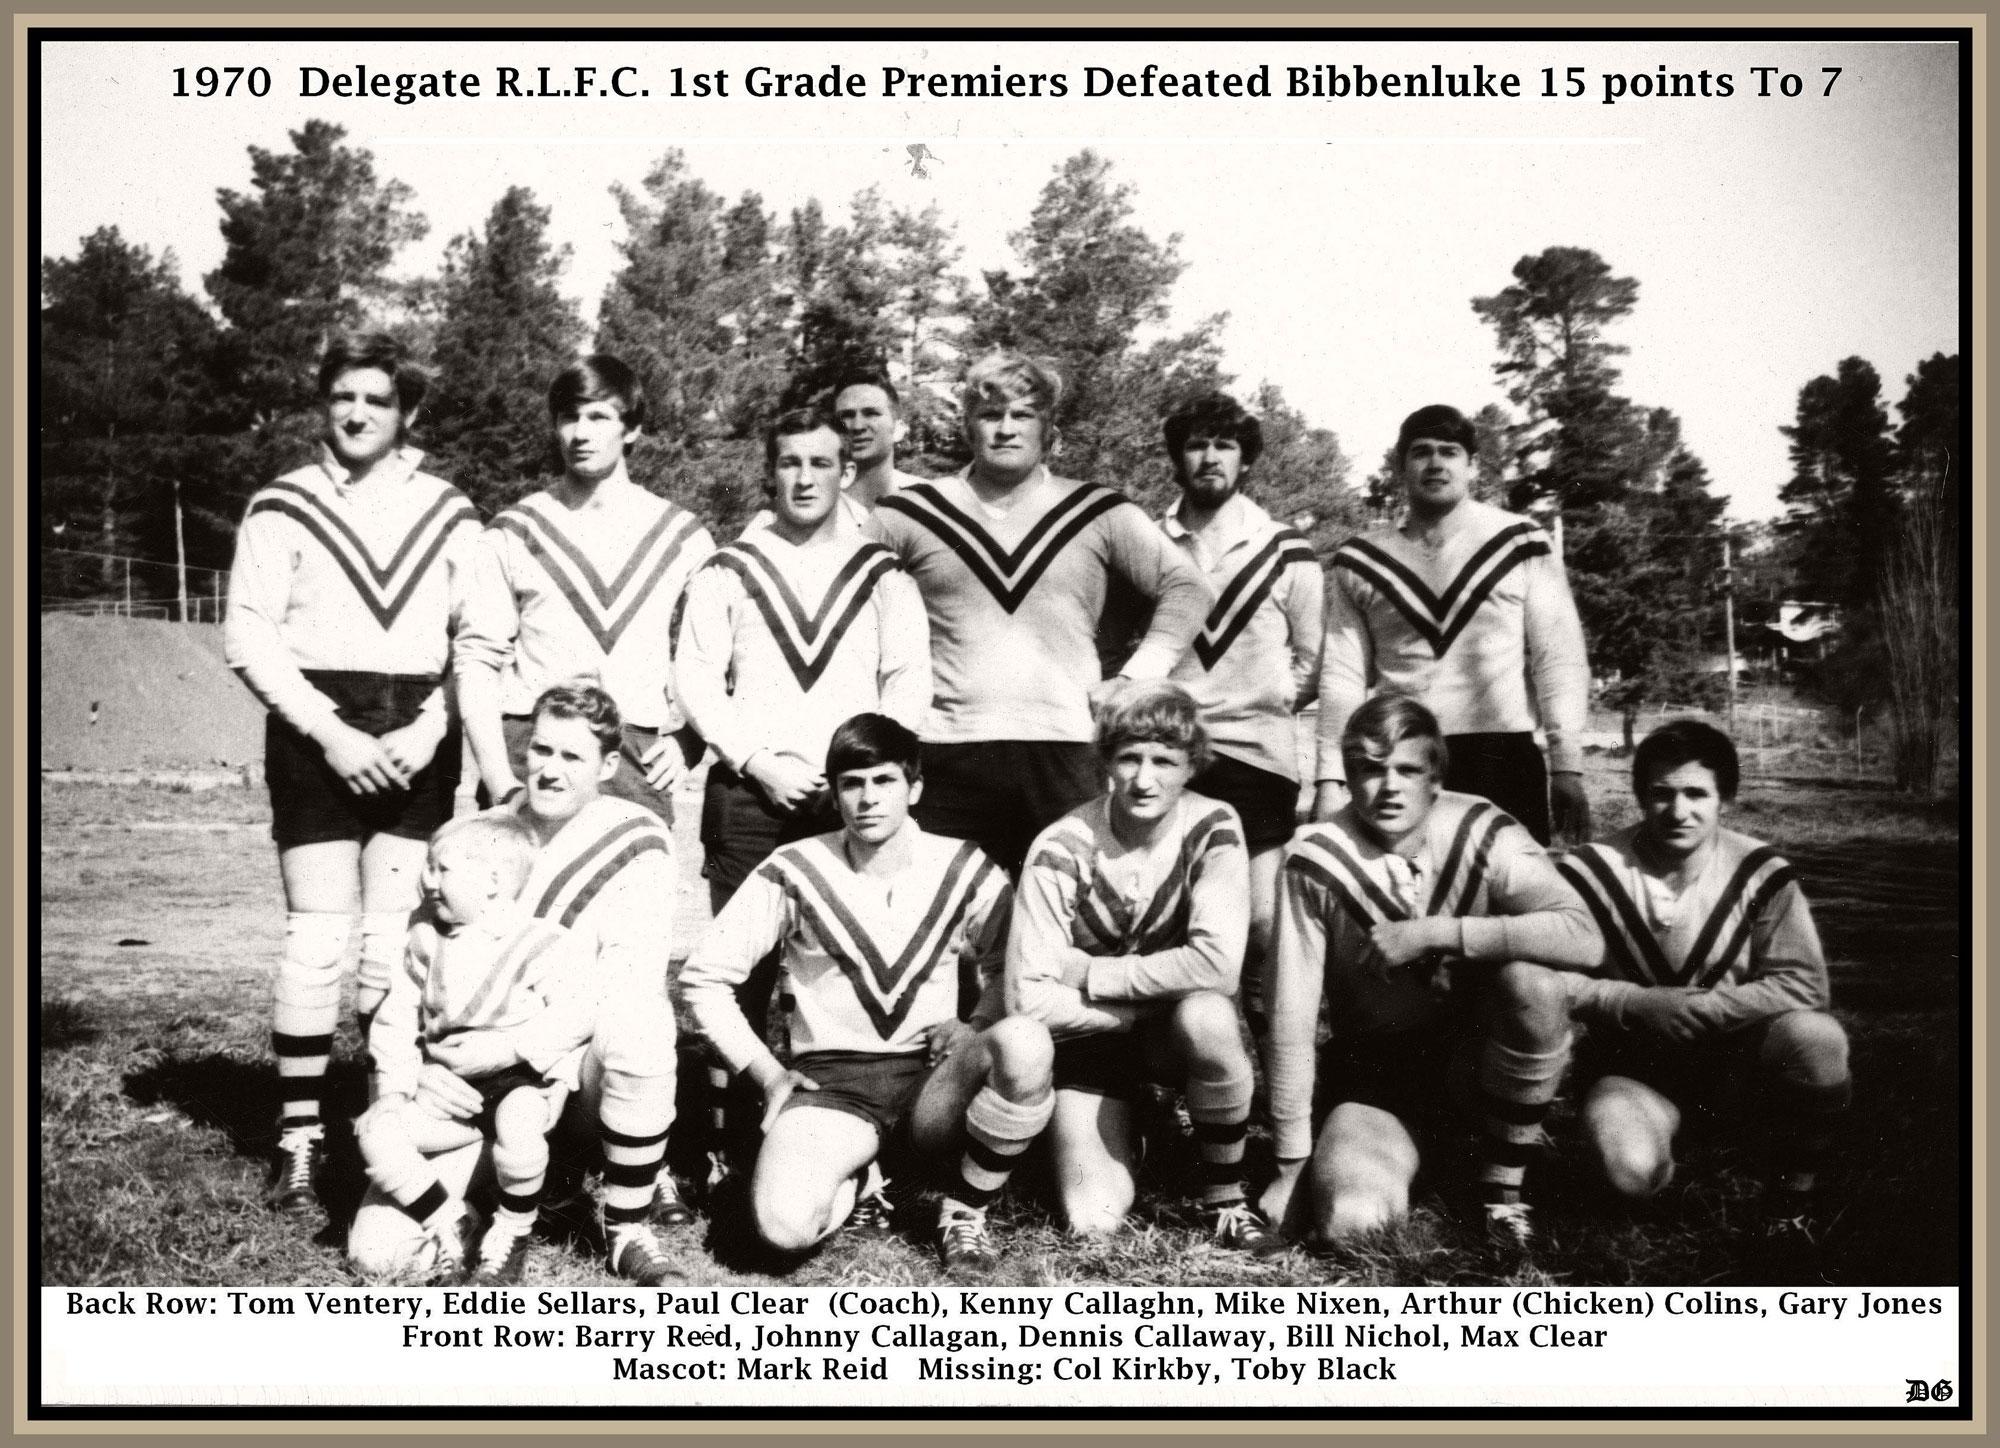 1970 Delegate clayton cup winners